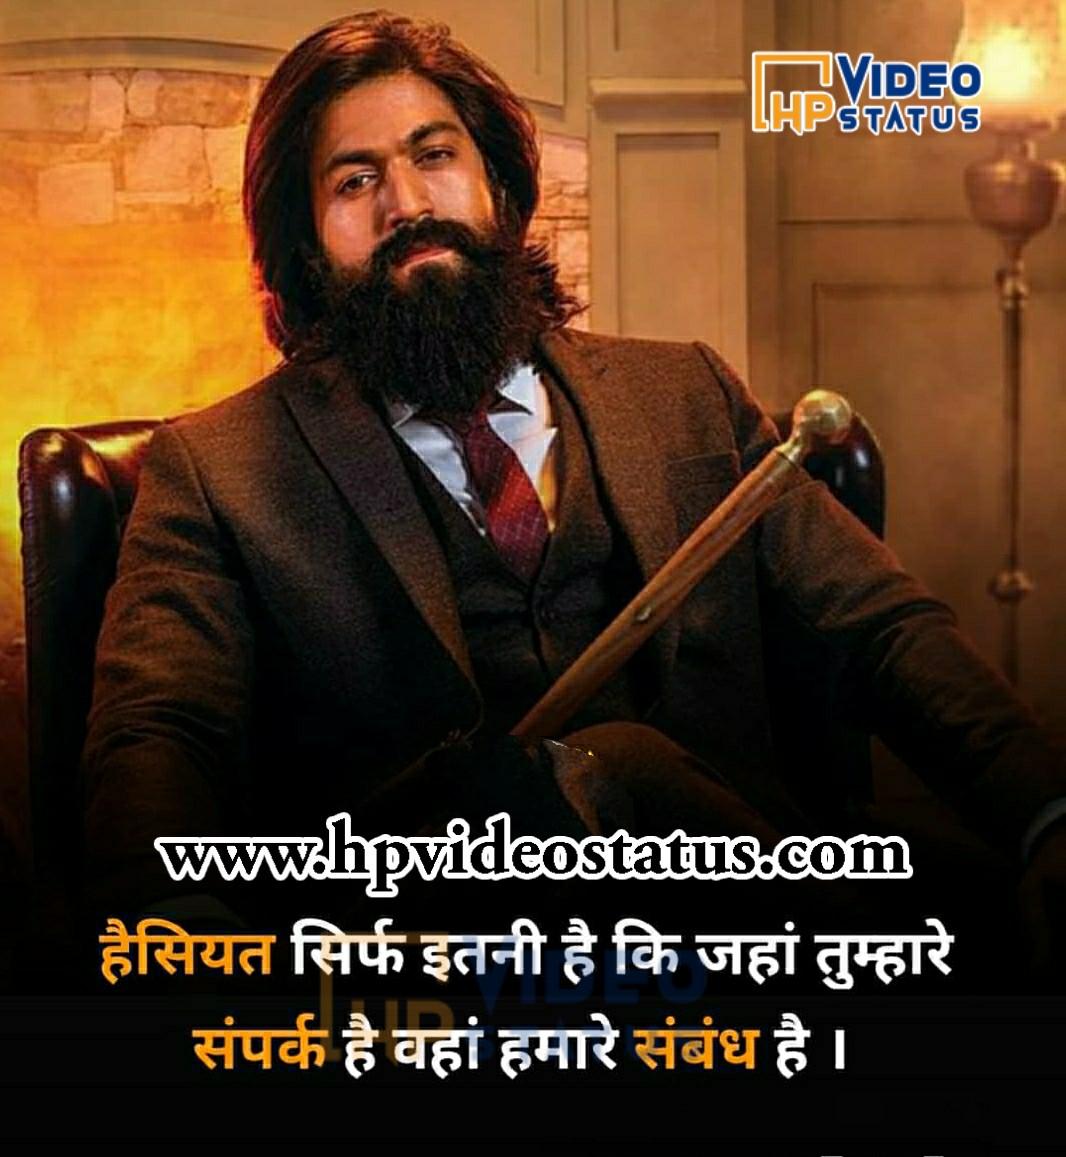 Attitude in whatsapp hindi status WhatsApp Attitude